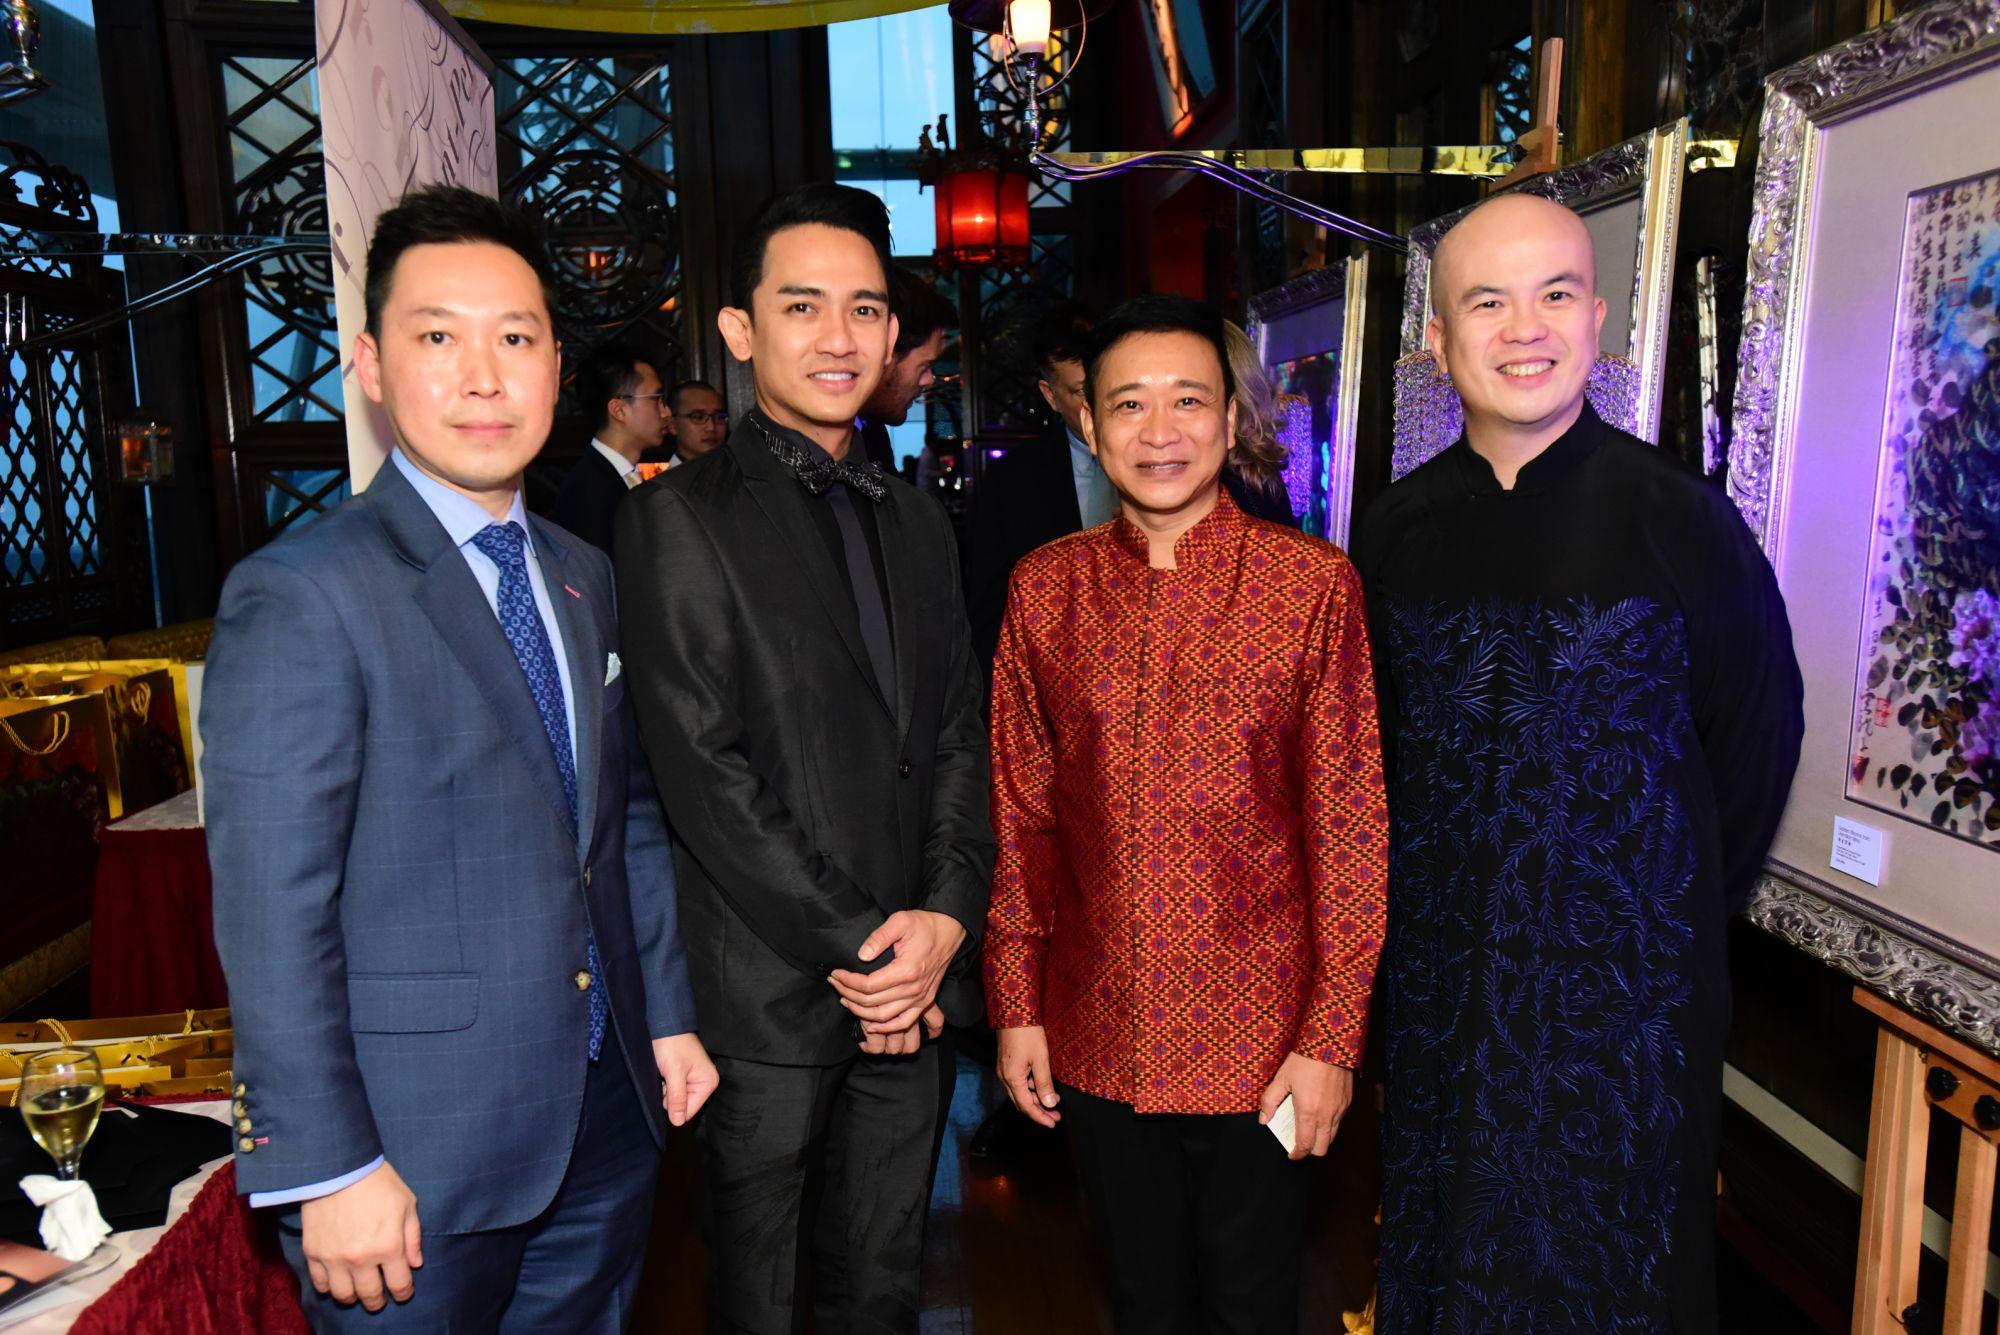 Nigel Chua, Manatase Annawat, Prince Sisowath Tesso, Yun Long Zi